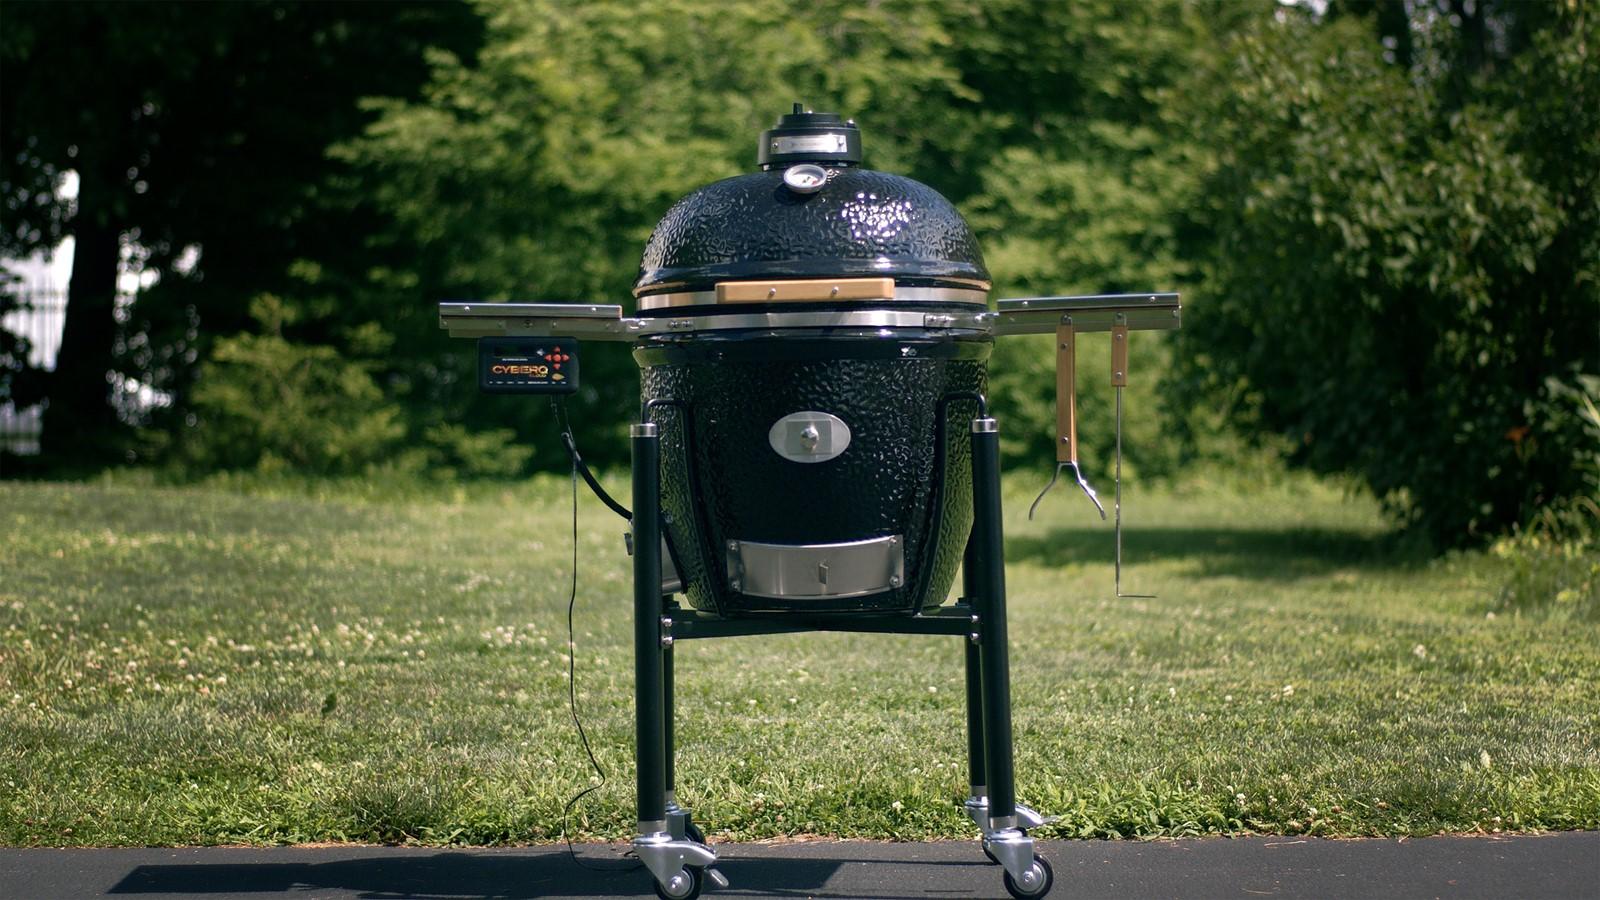 gas vs charcoal grills still a heated debate baltimore sun baltimore sun